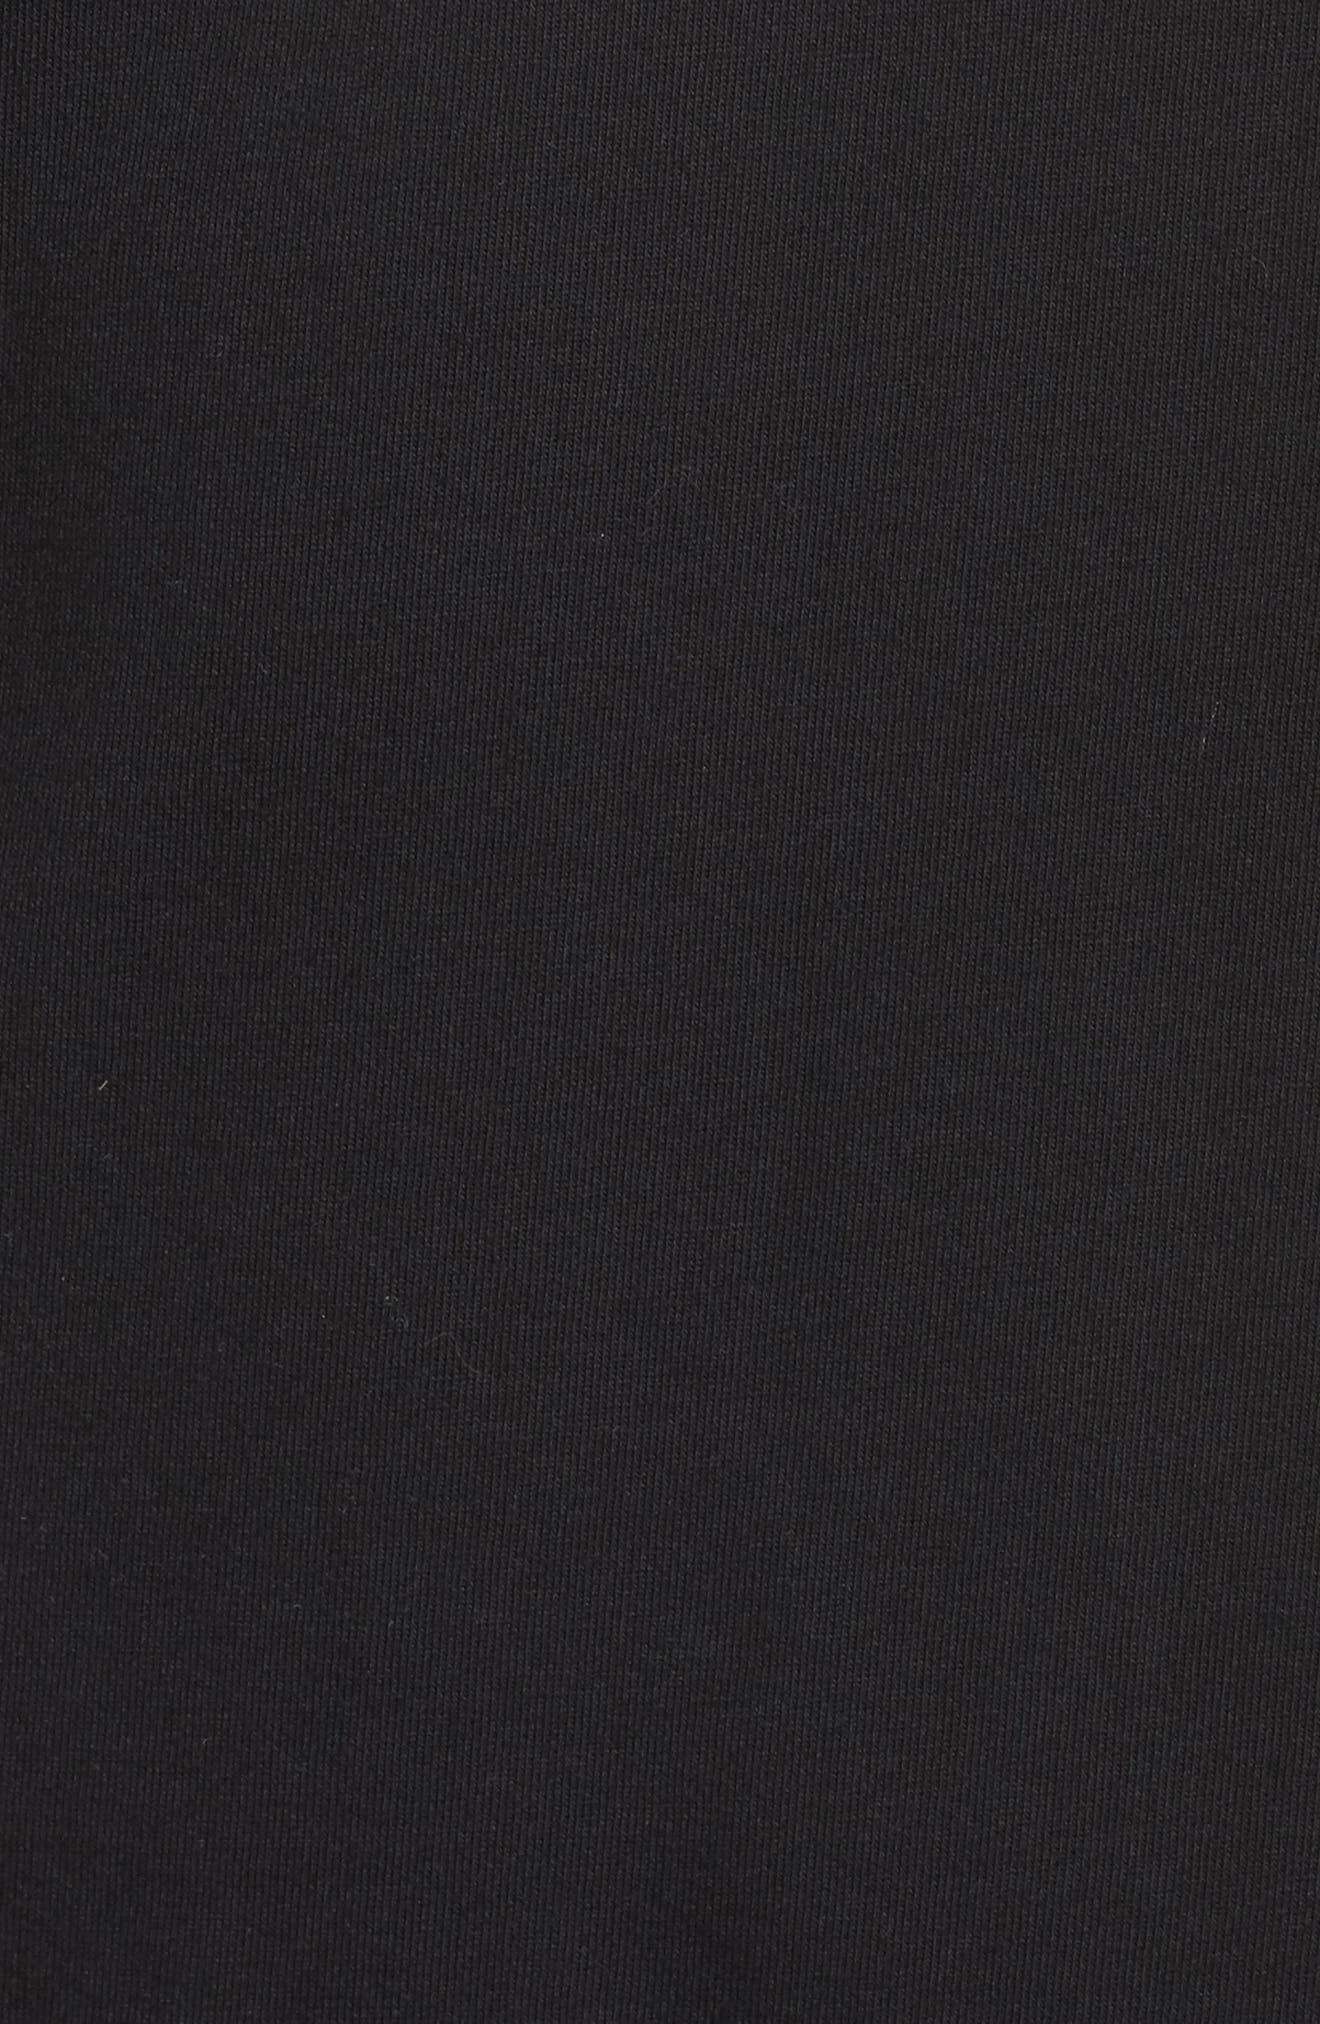 Sportswear HBR Women's Long Sleeve Tee,                             Alternate thumbnail 8, color,                             010